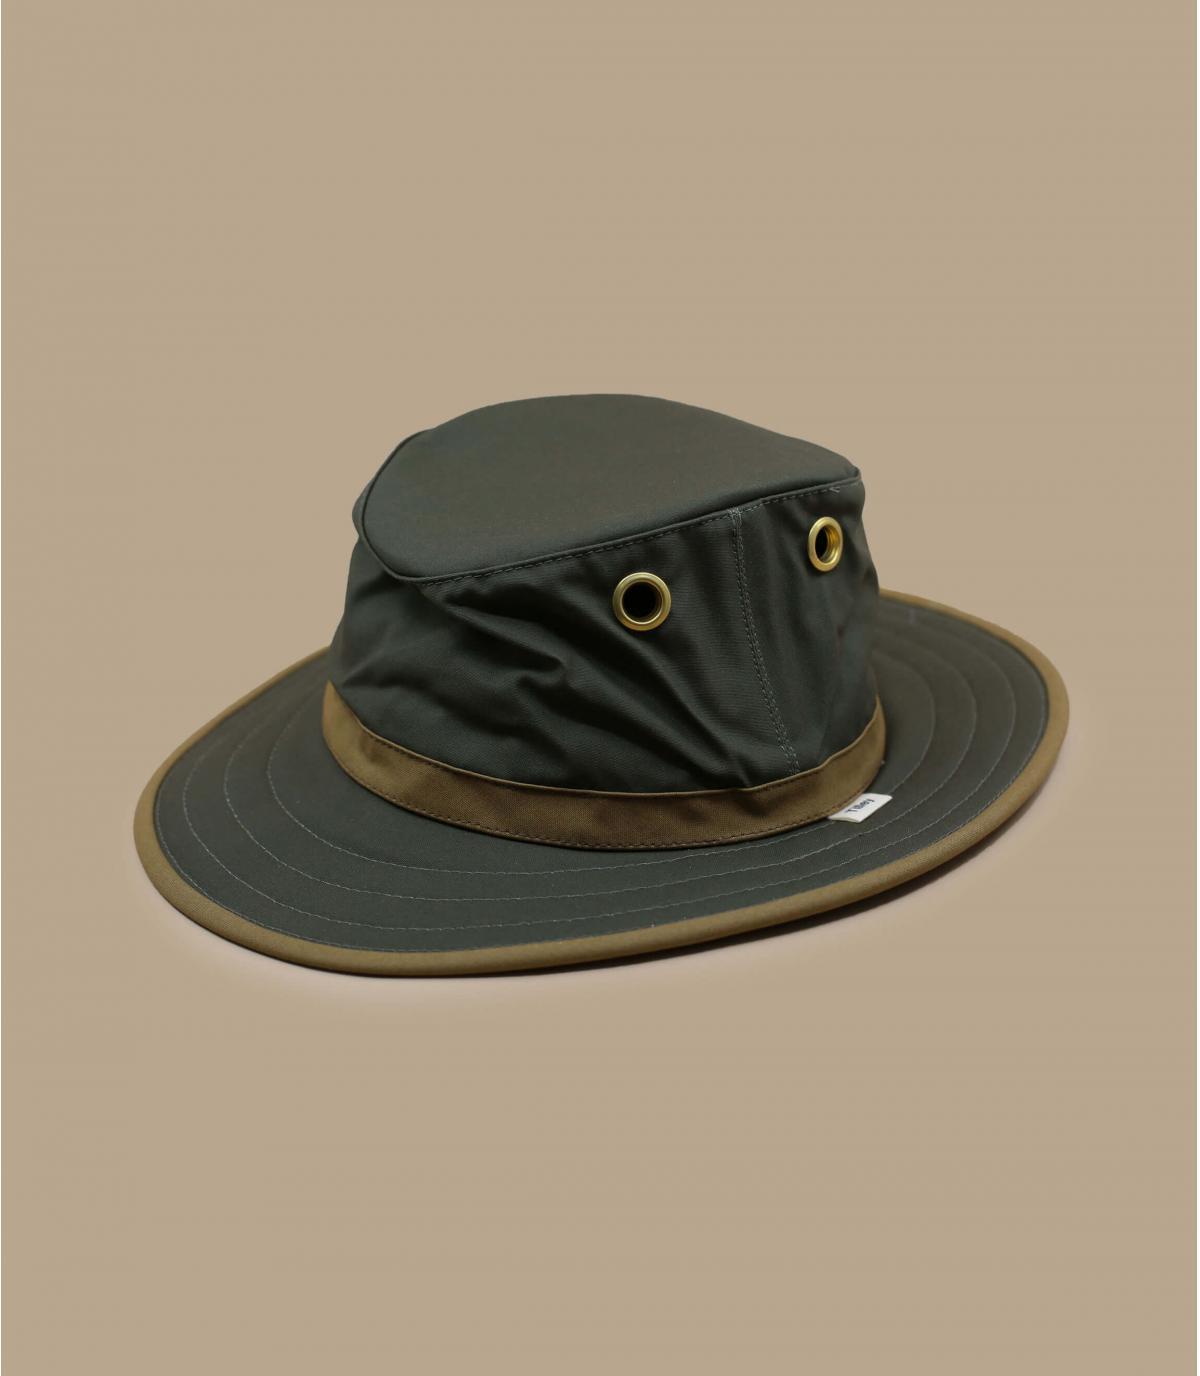 Détails Outback green british tan - image 2